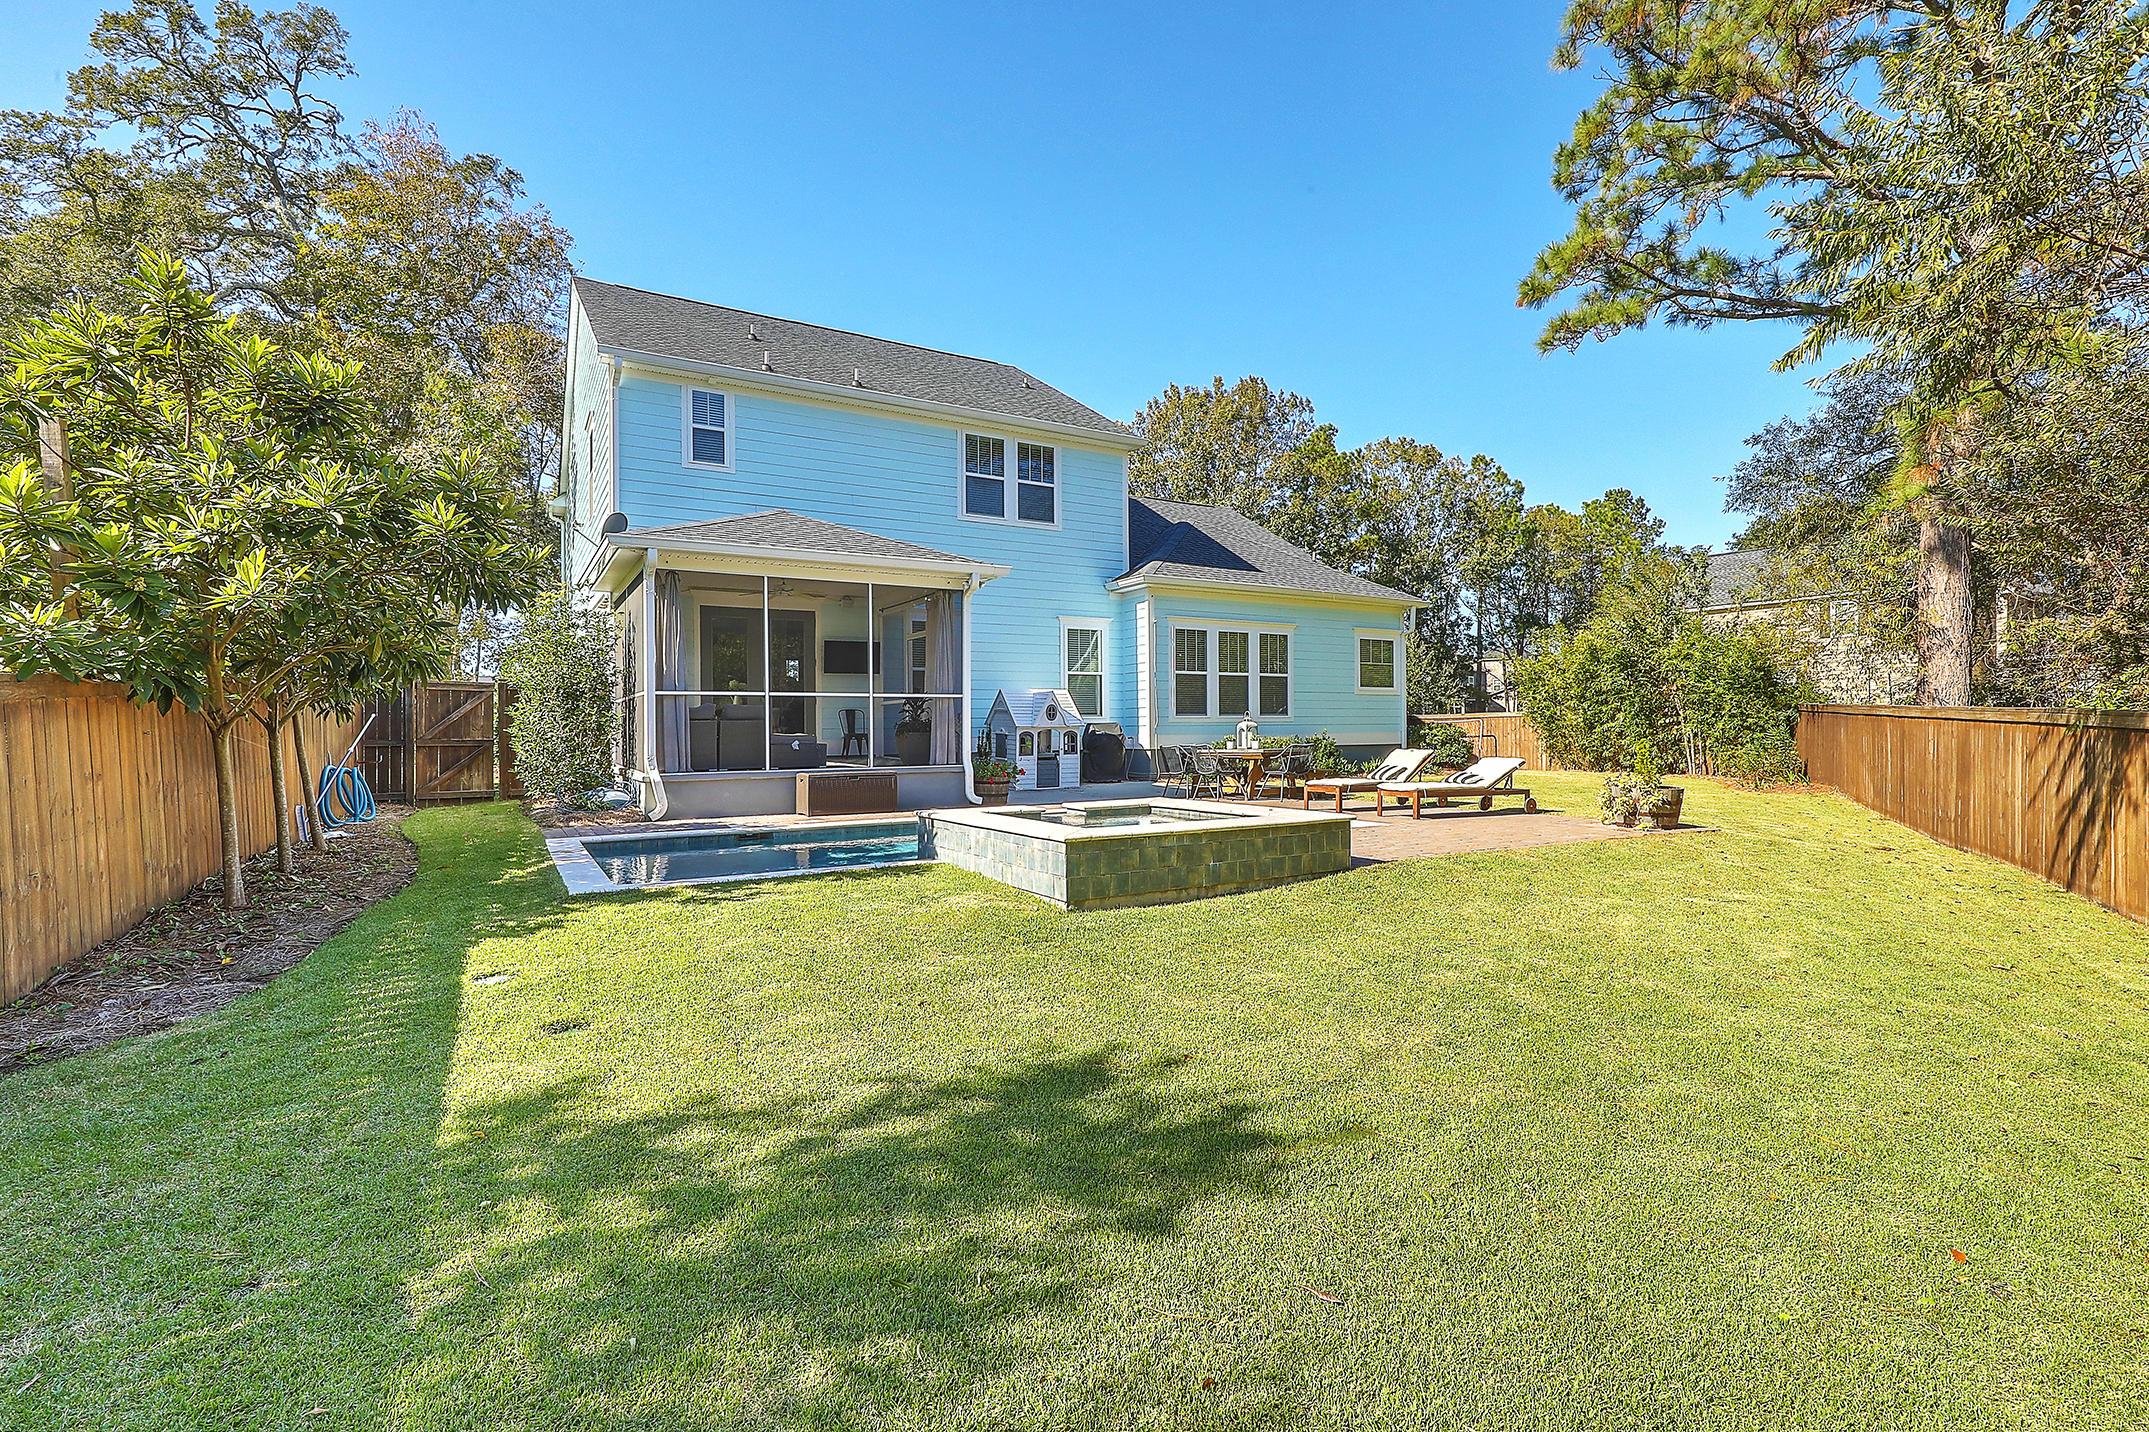 Stiles Point Plantation Homes For Sale - 750 Old Plantation, Charleston, SC - 28